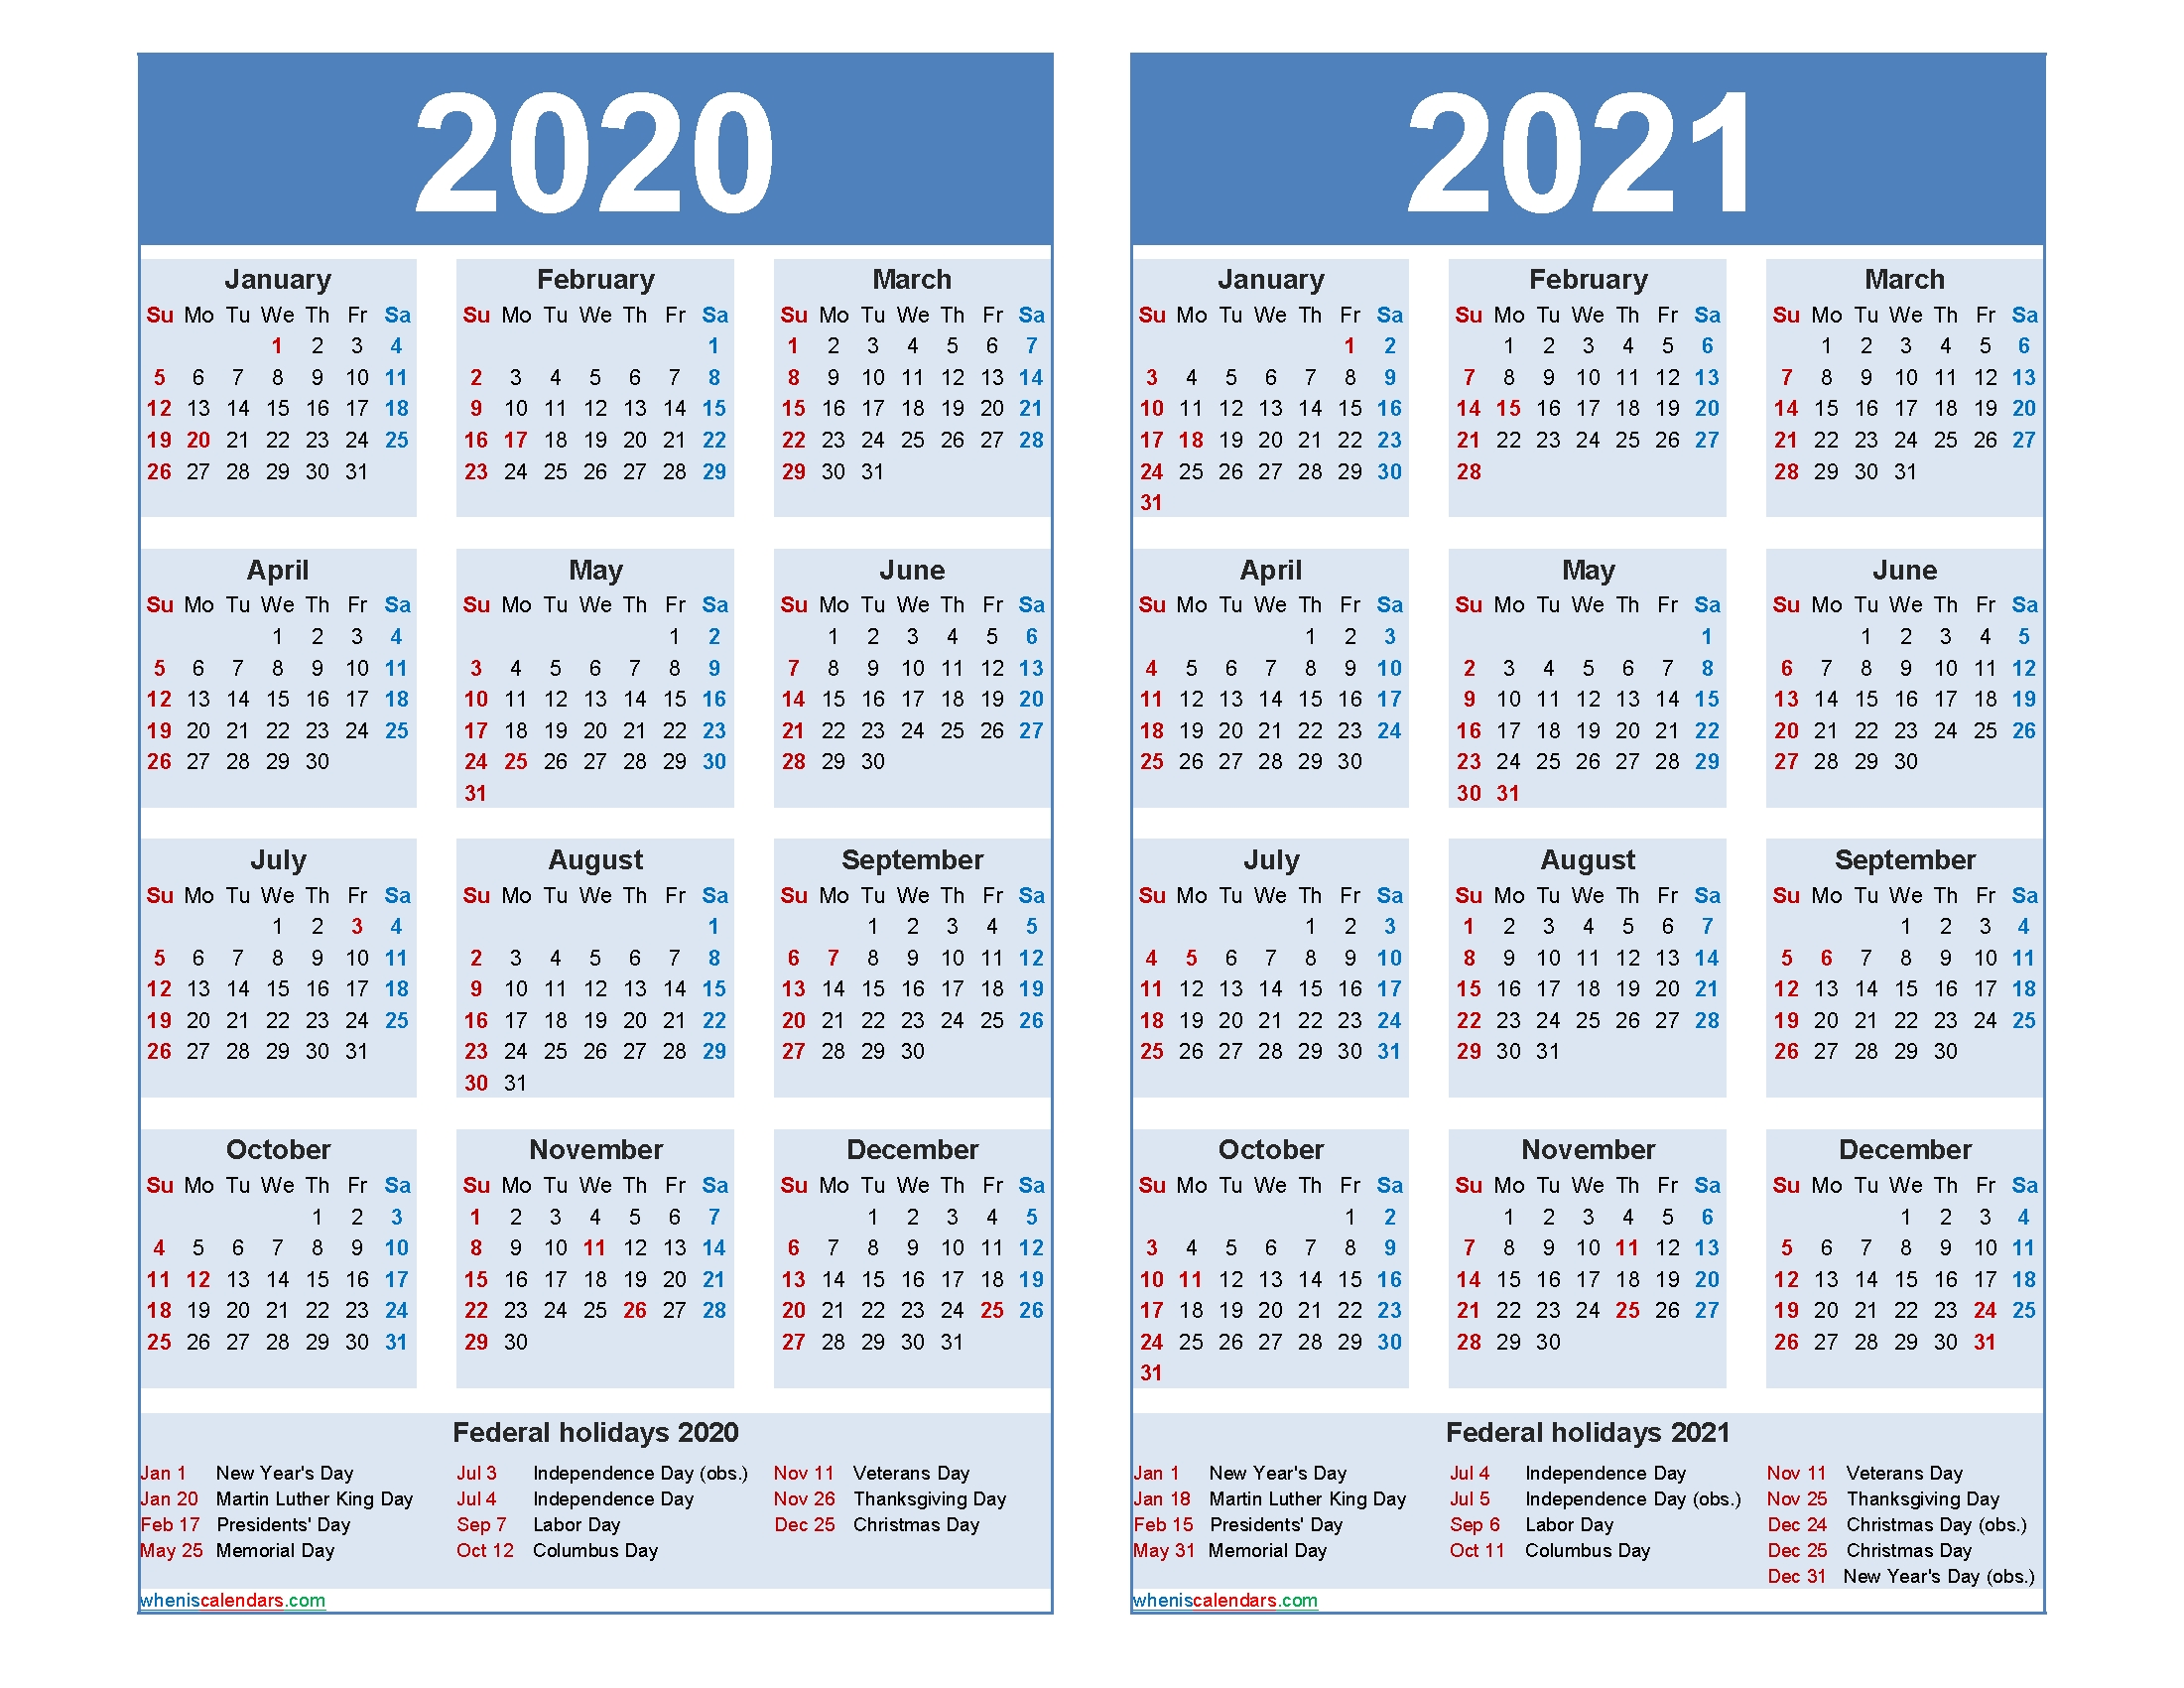 Free 2020 2021 Calendar Printable Word, Pdf – Free Printable